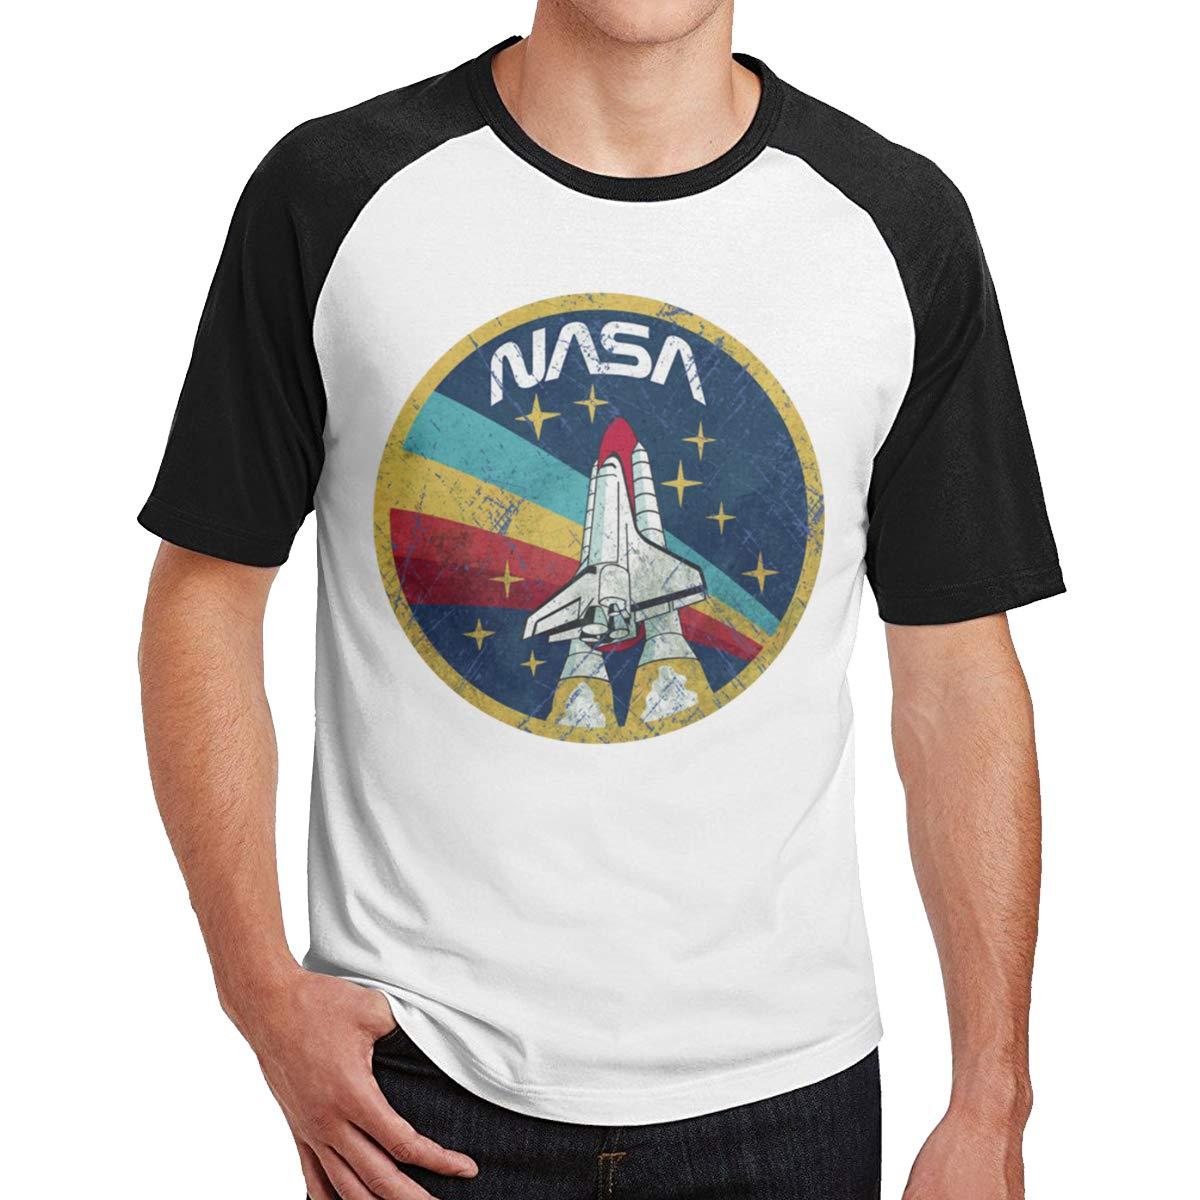 Bloonmer Mens Weekend NASA Vintage Short Sleeve Shirts